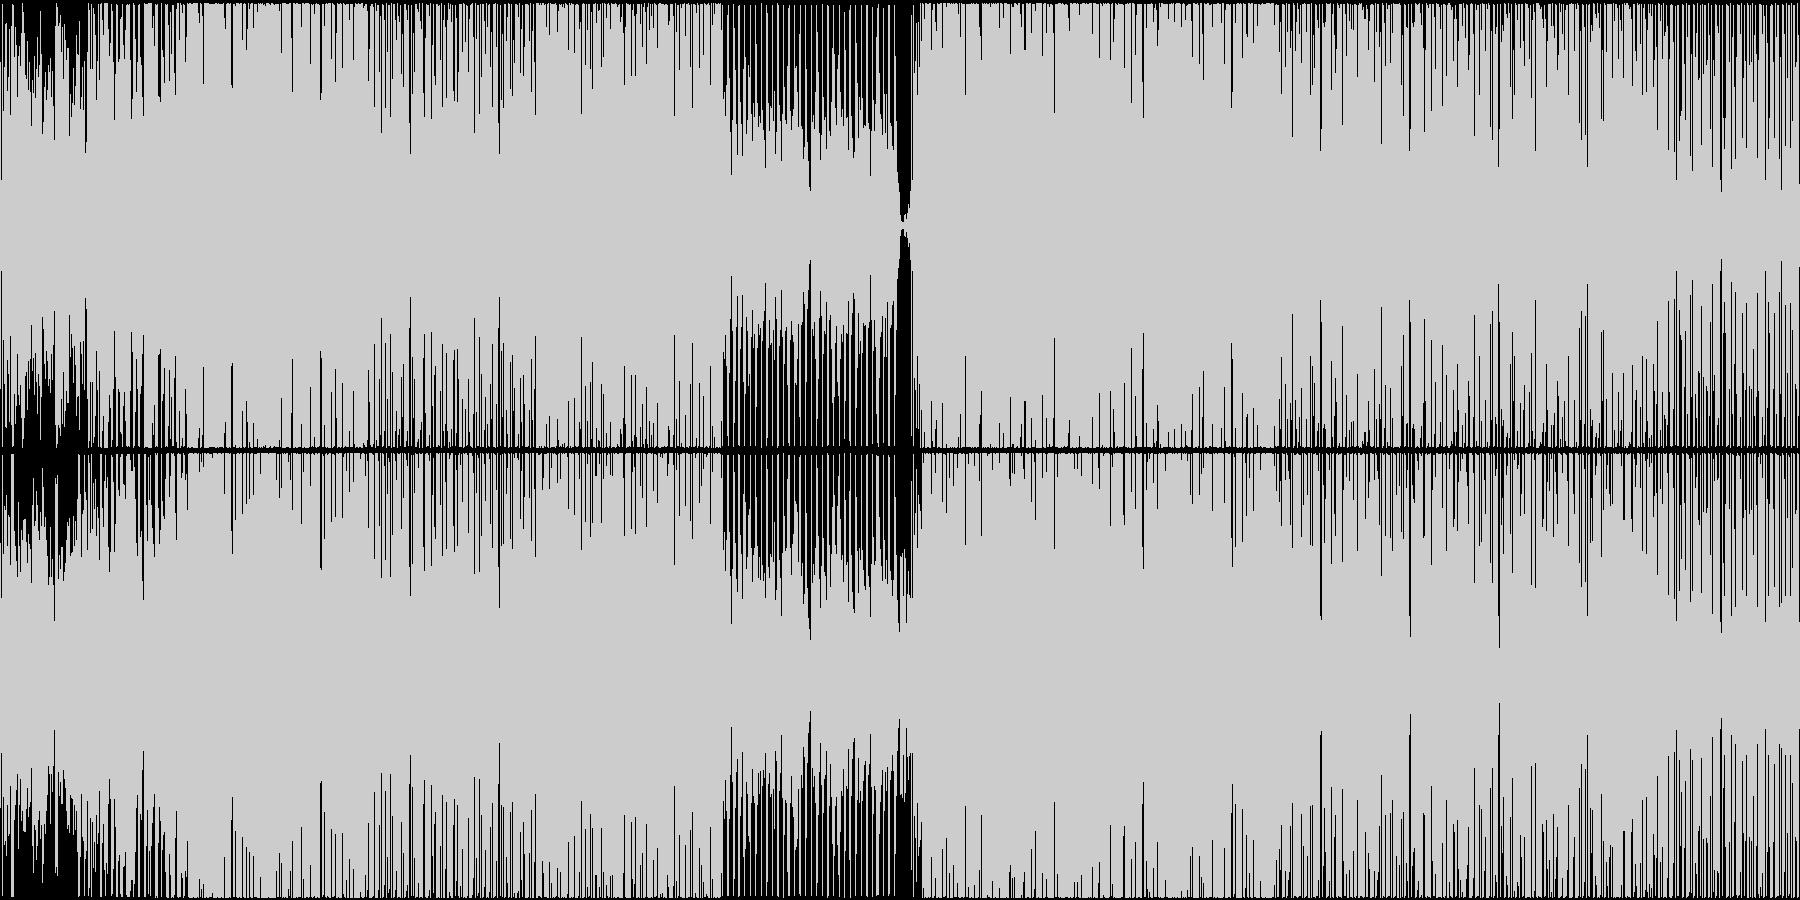 EDM トロピカル レゲエ 哀愁 RAPの未再生の波形